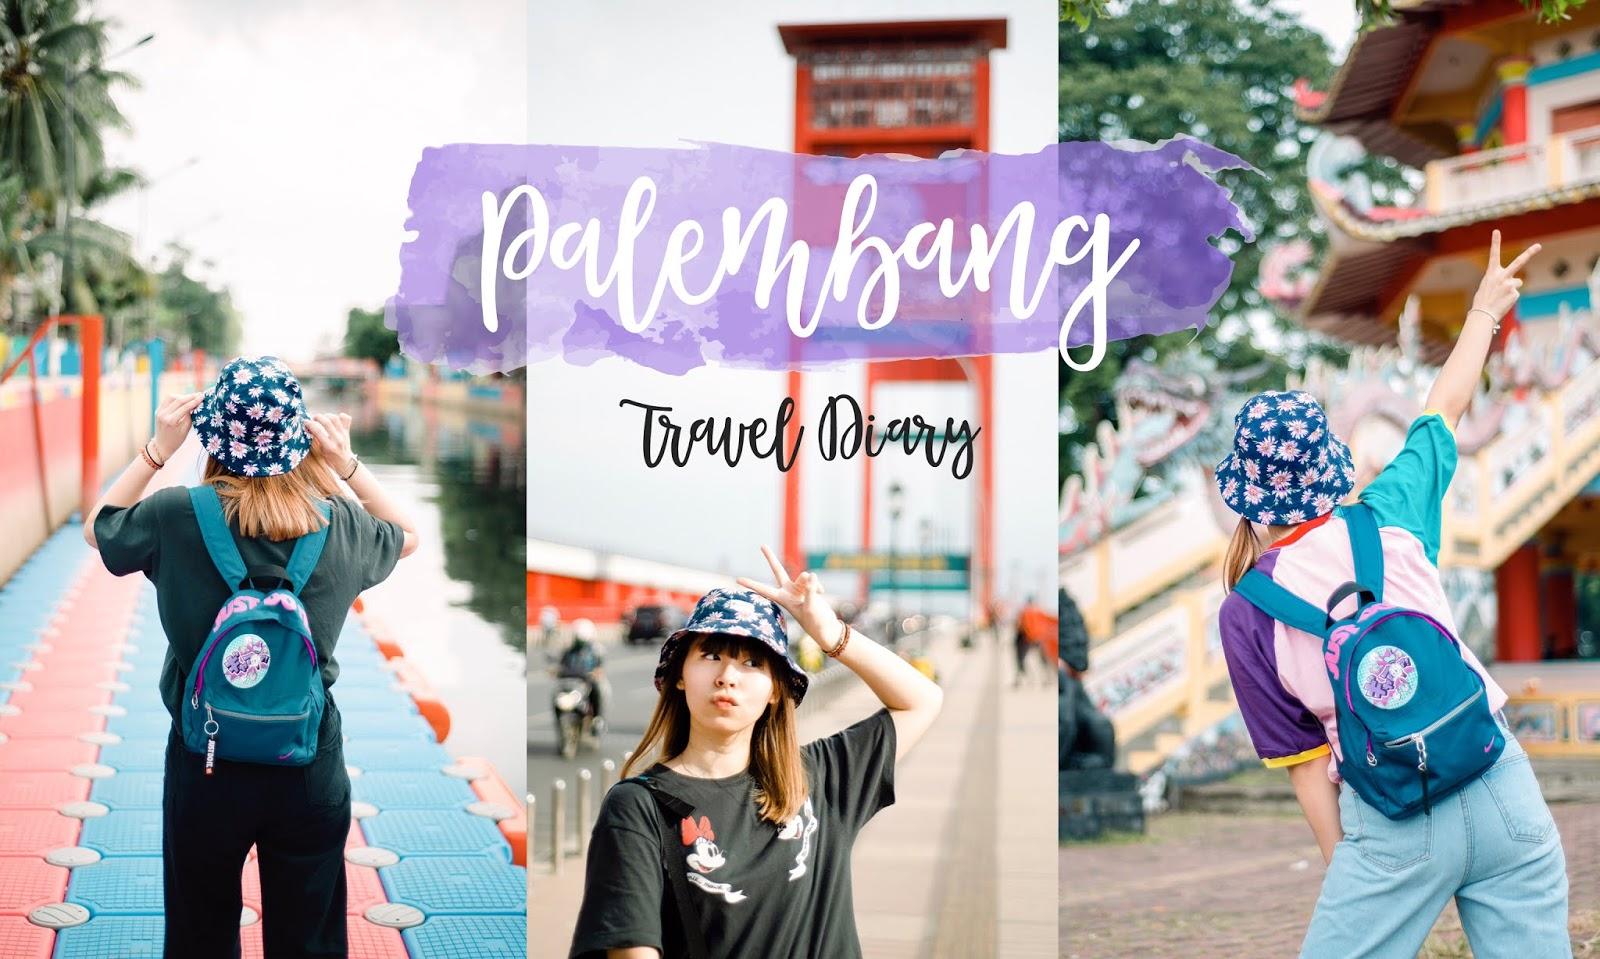 Palembang Travel Diary | www.bigdreamerblog.com